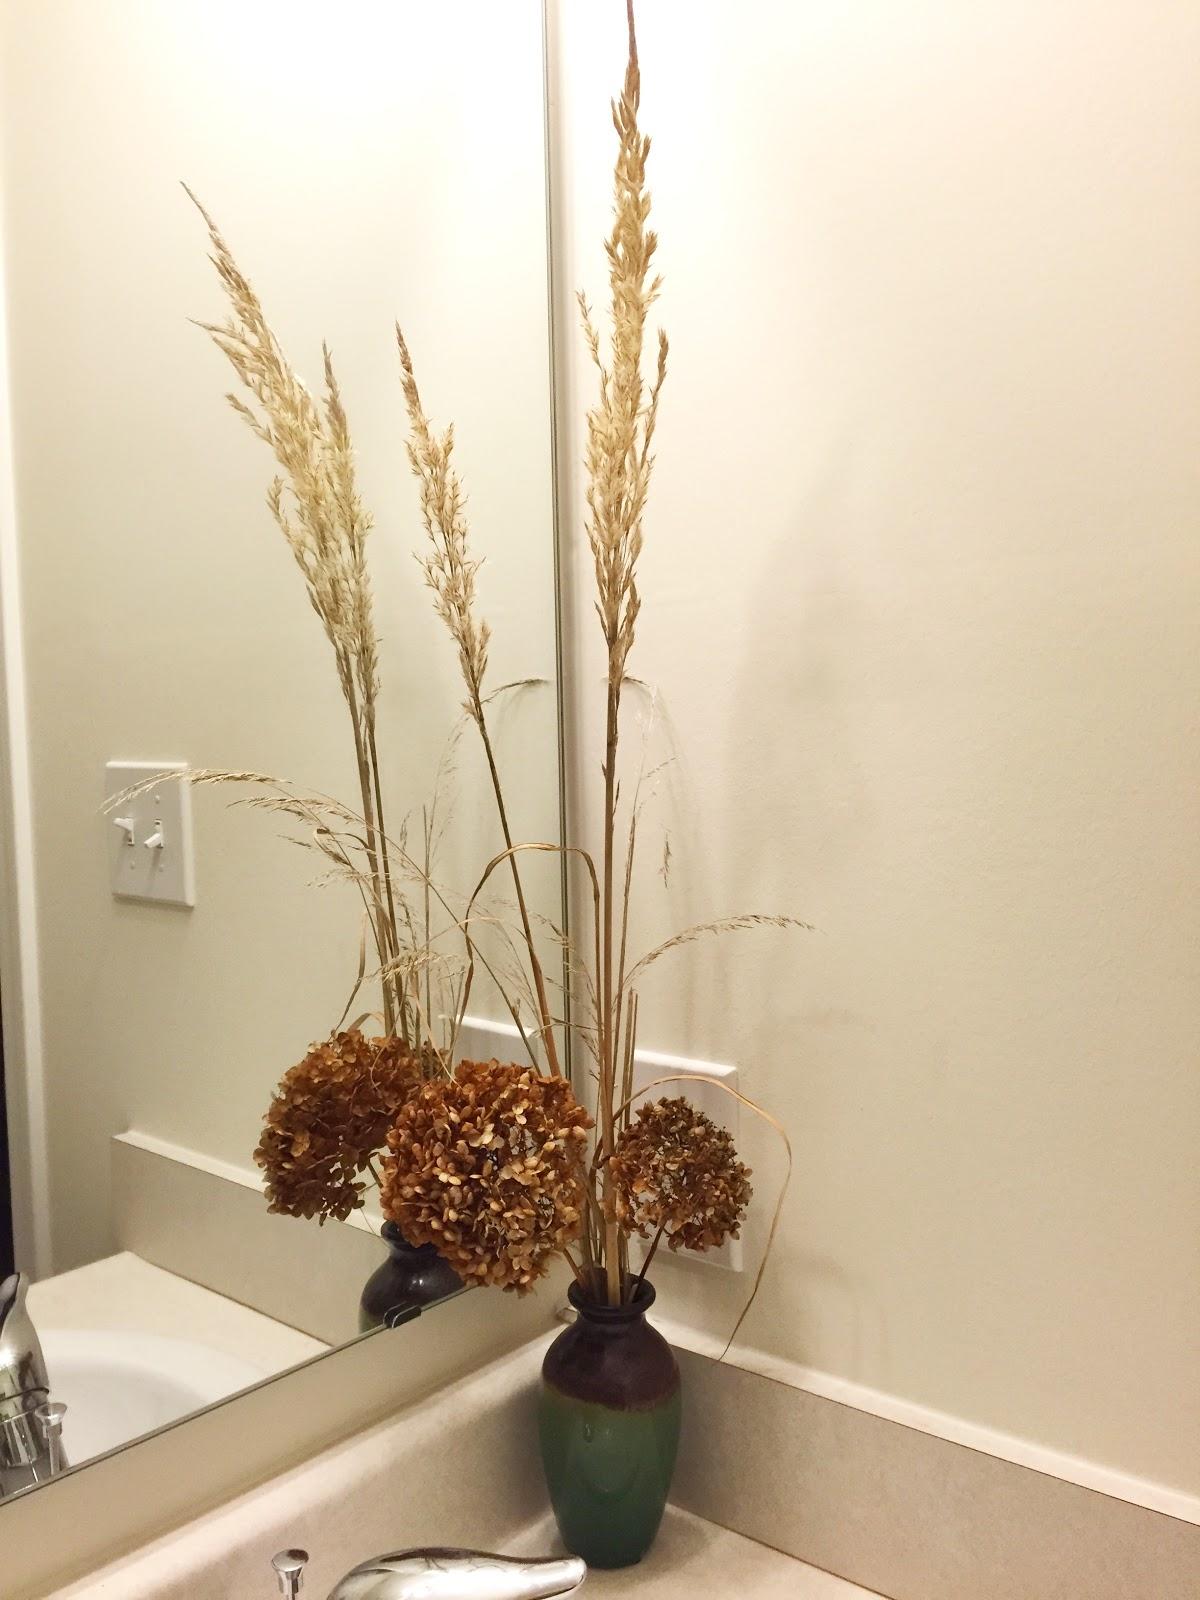 My First Dry Flower Arrangement Karl Foerster Annabelle